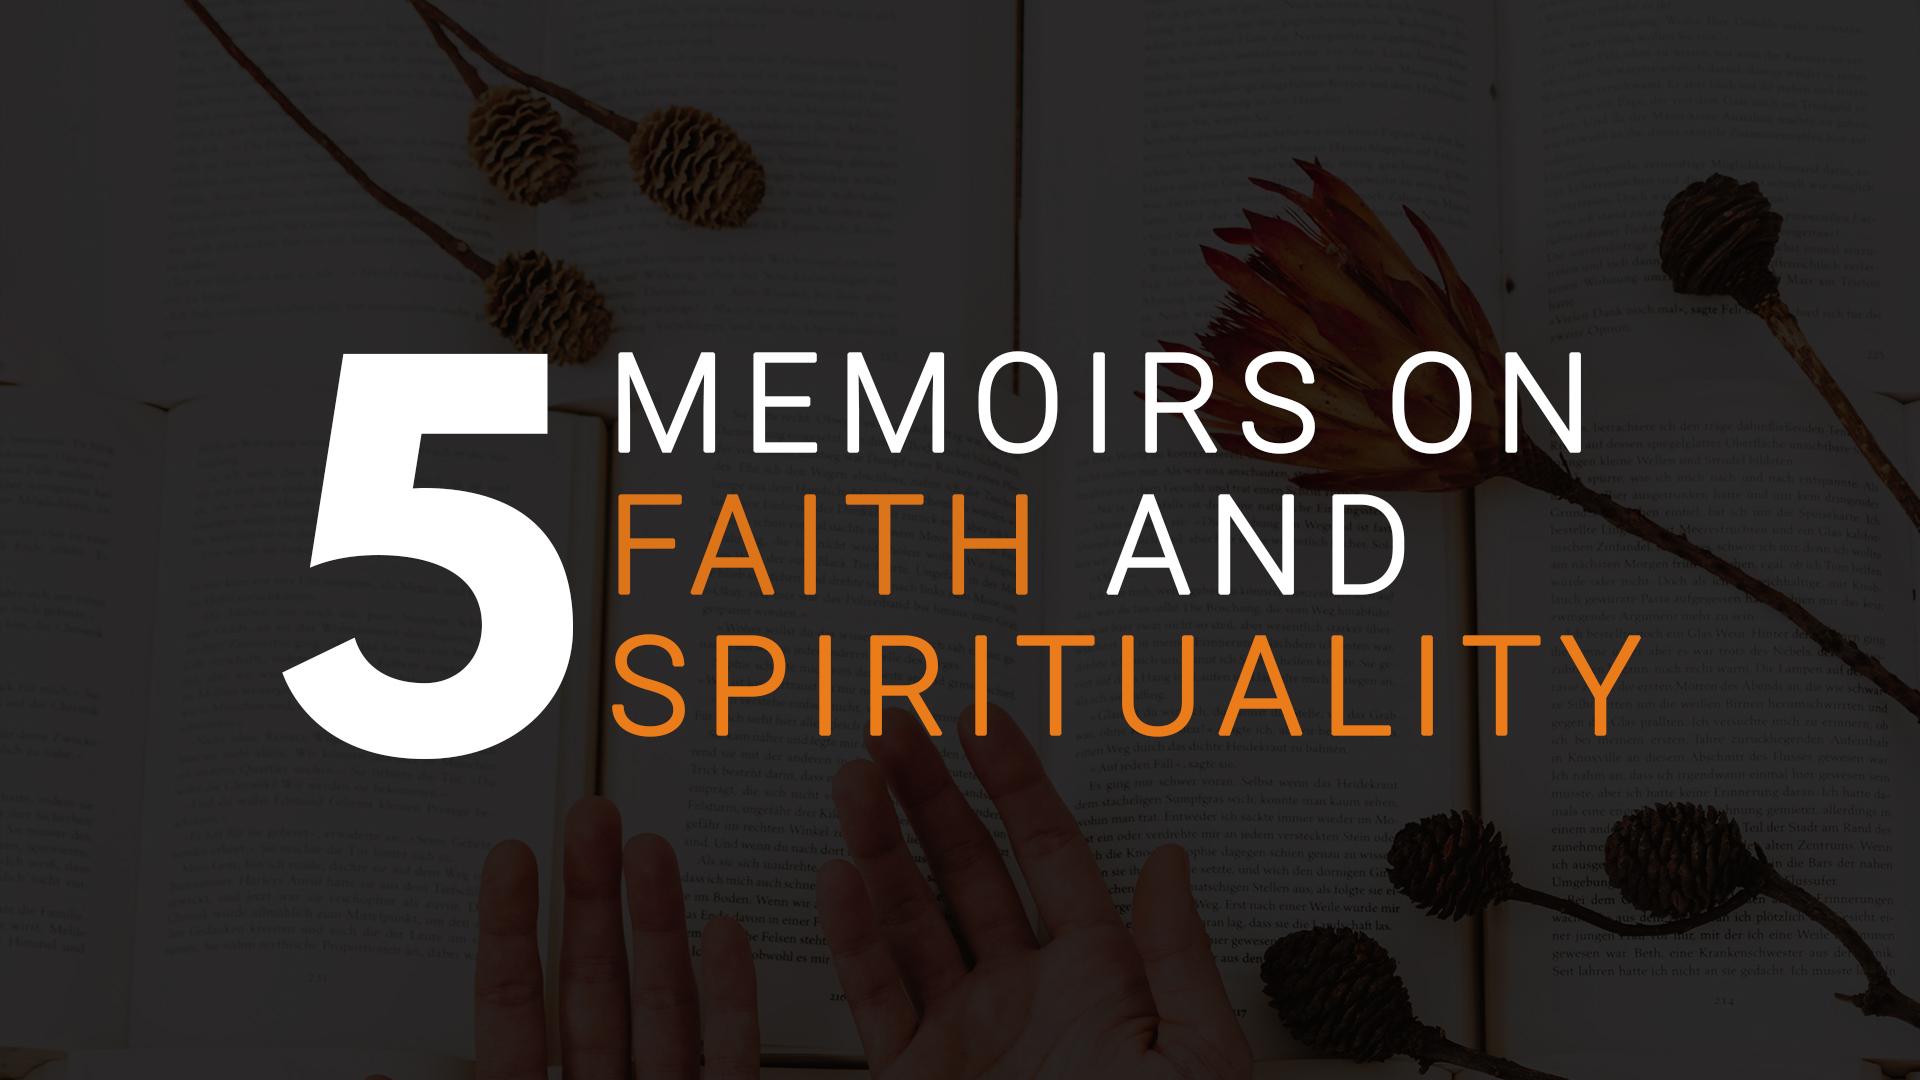 Five Memoirs on Faith and Spirituality